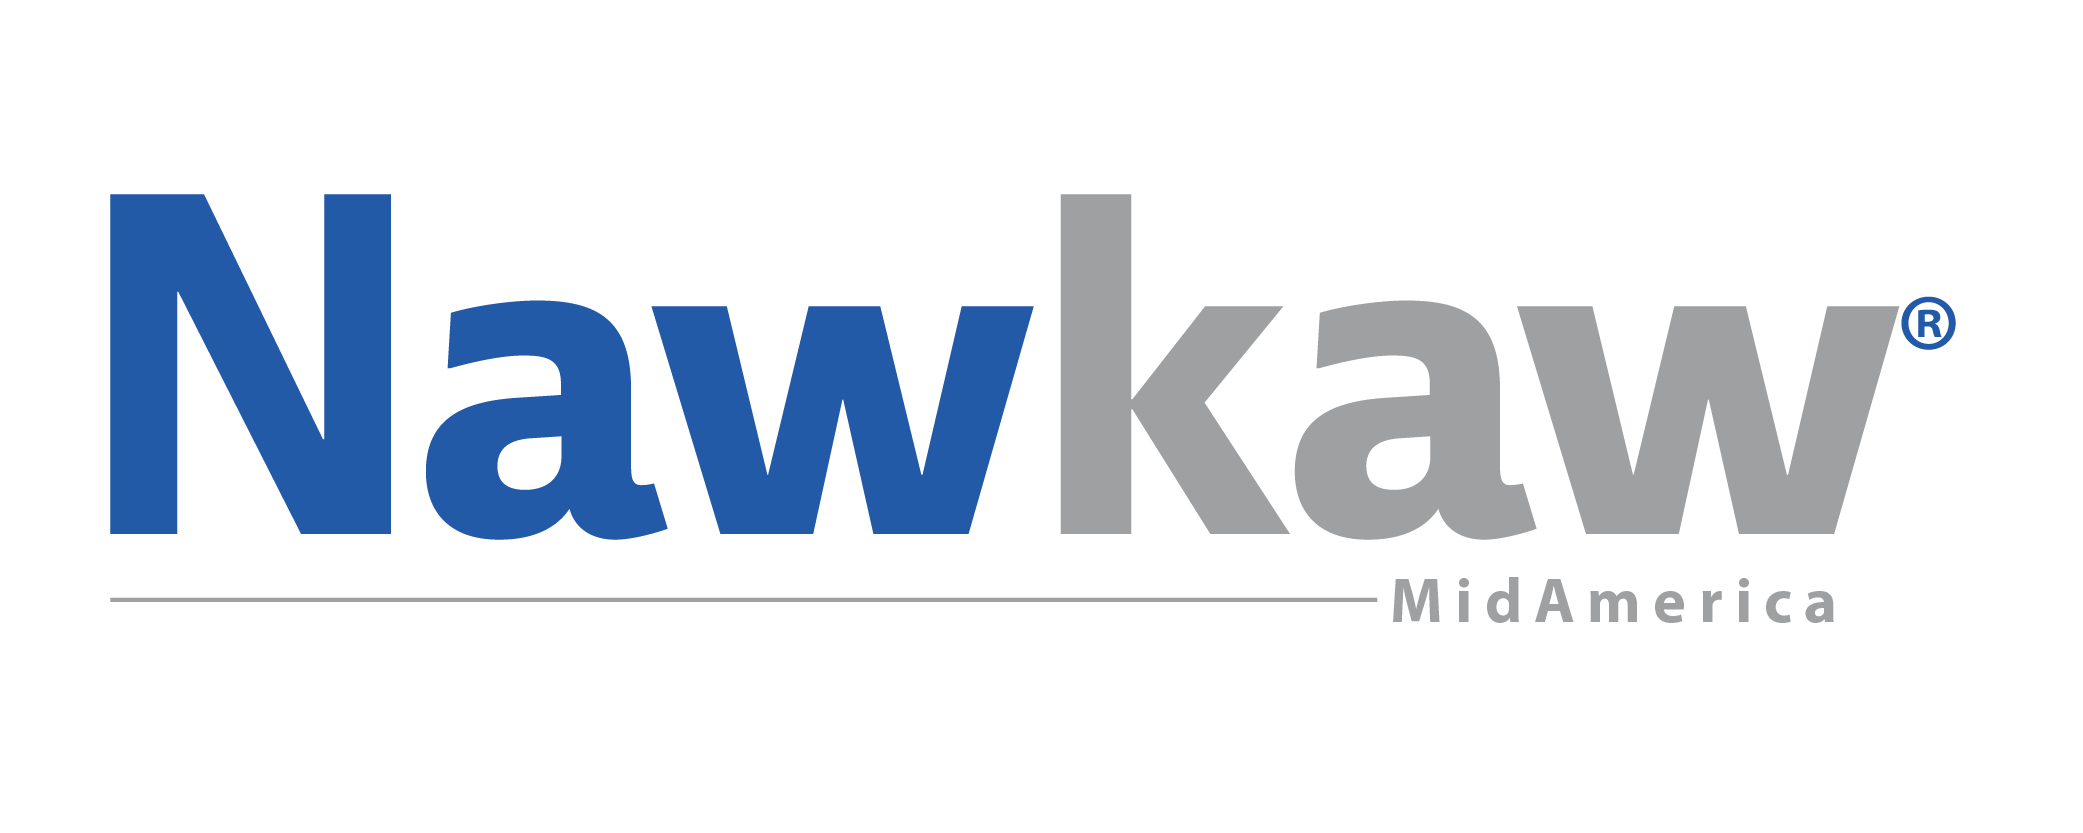 Nawkaw Midamerica logo